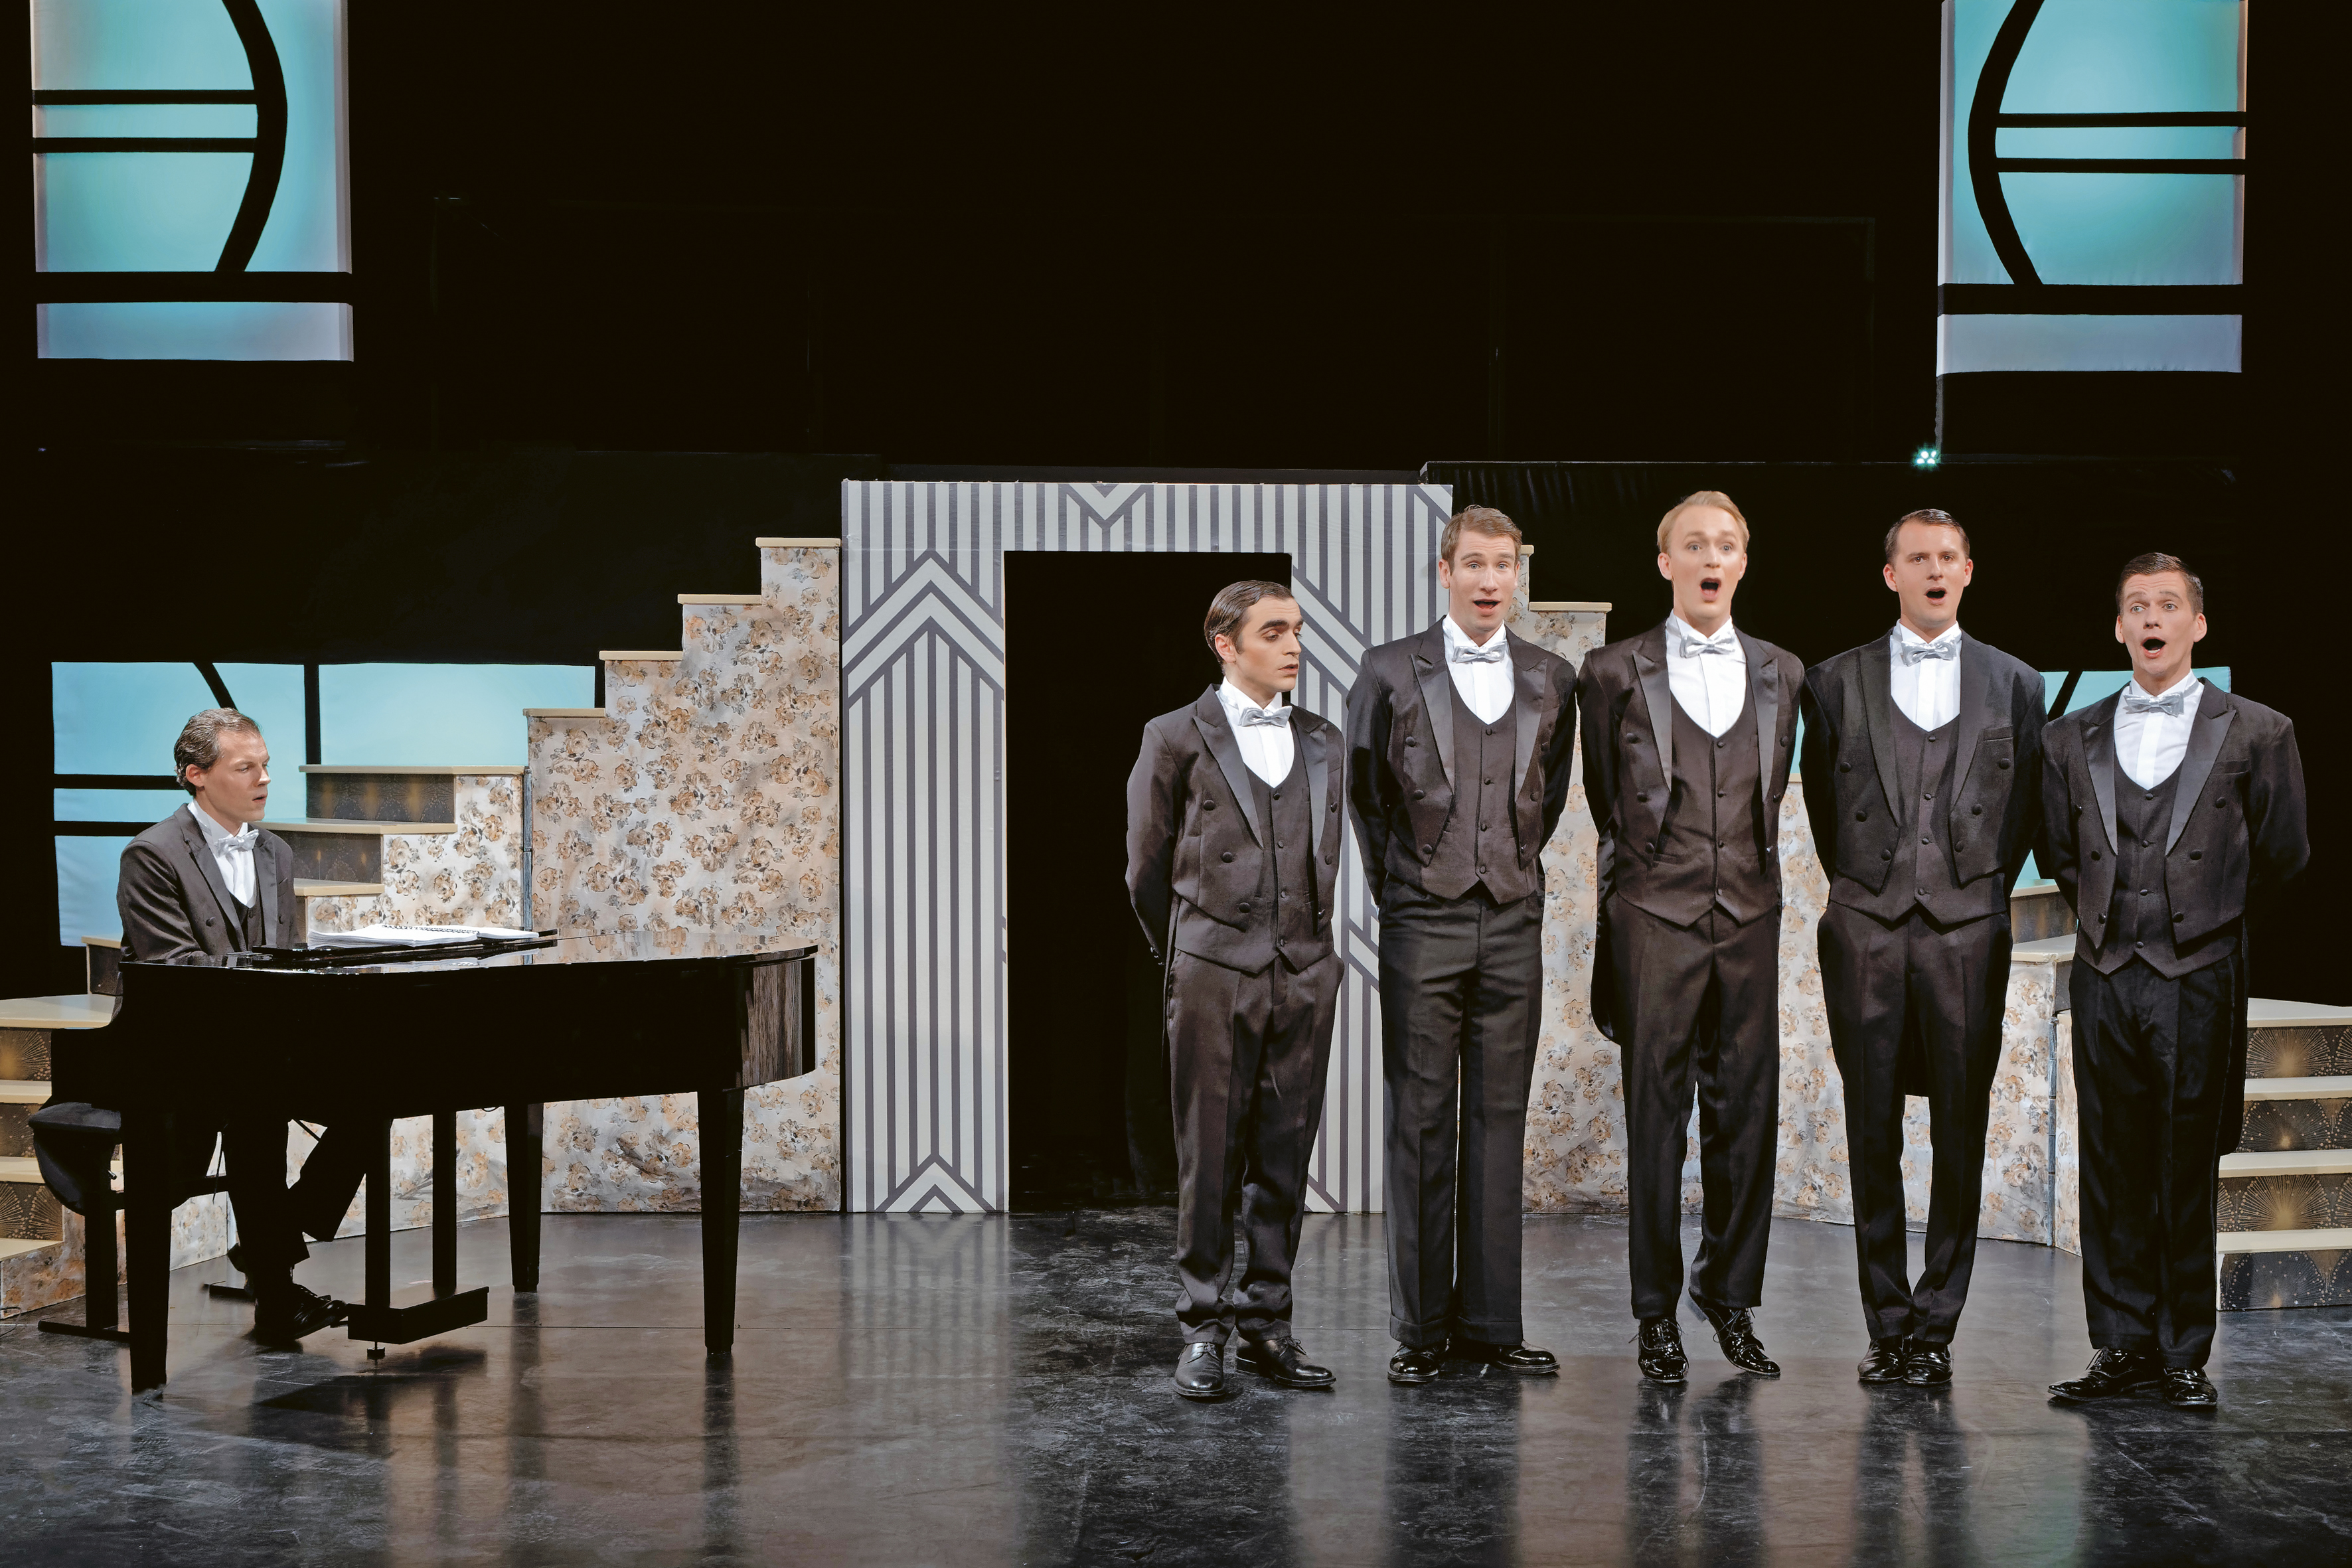 Bild: Die Comedian Harmonists in der Kammeroper Köln.